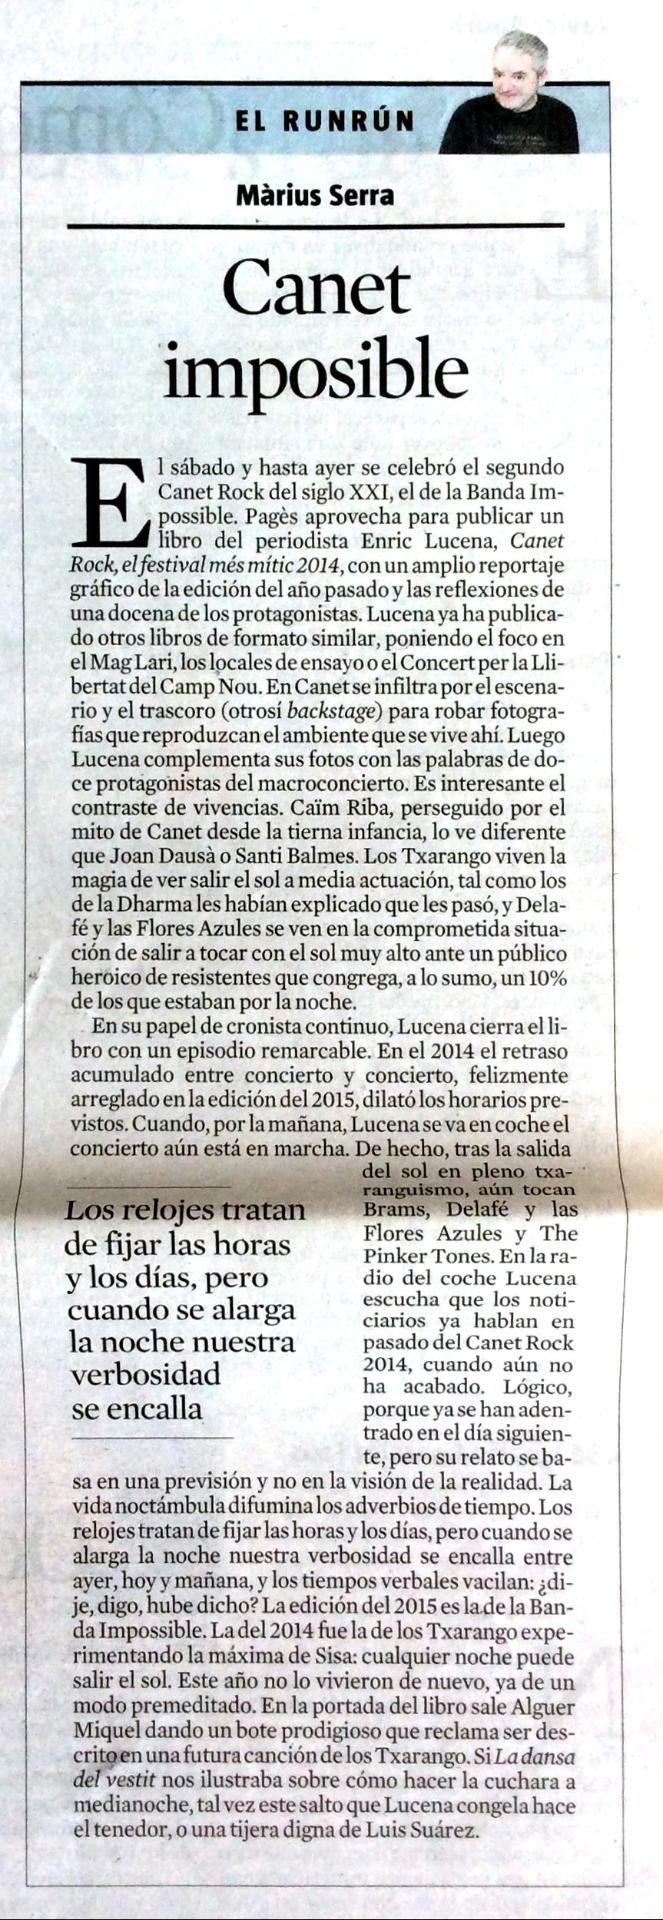 La Vanguardia. 6 juliol 2015